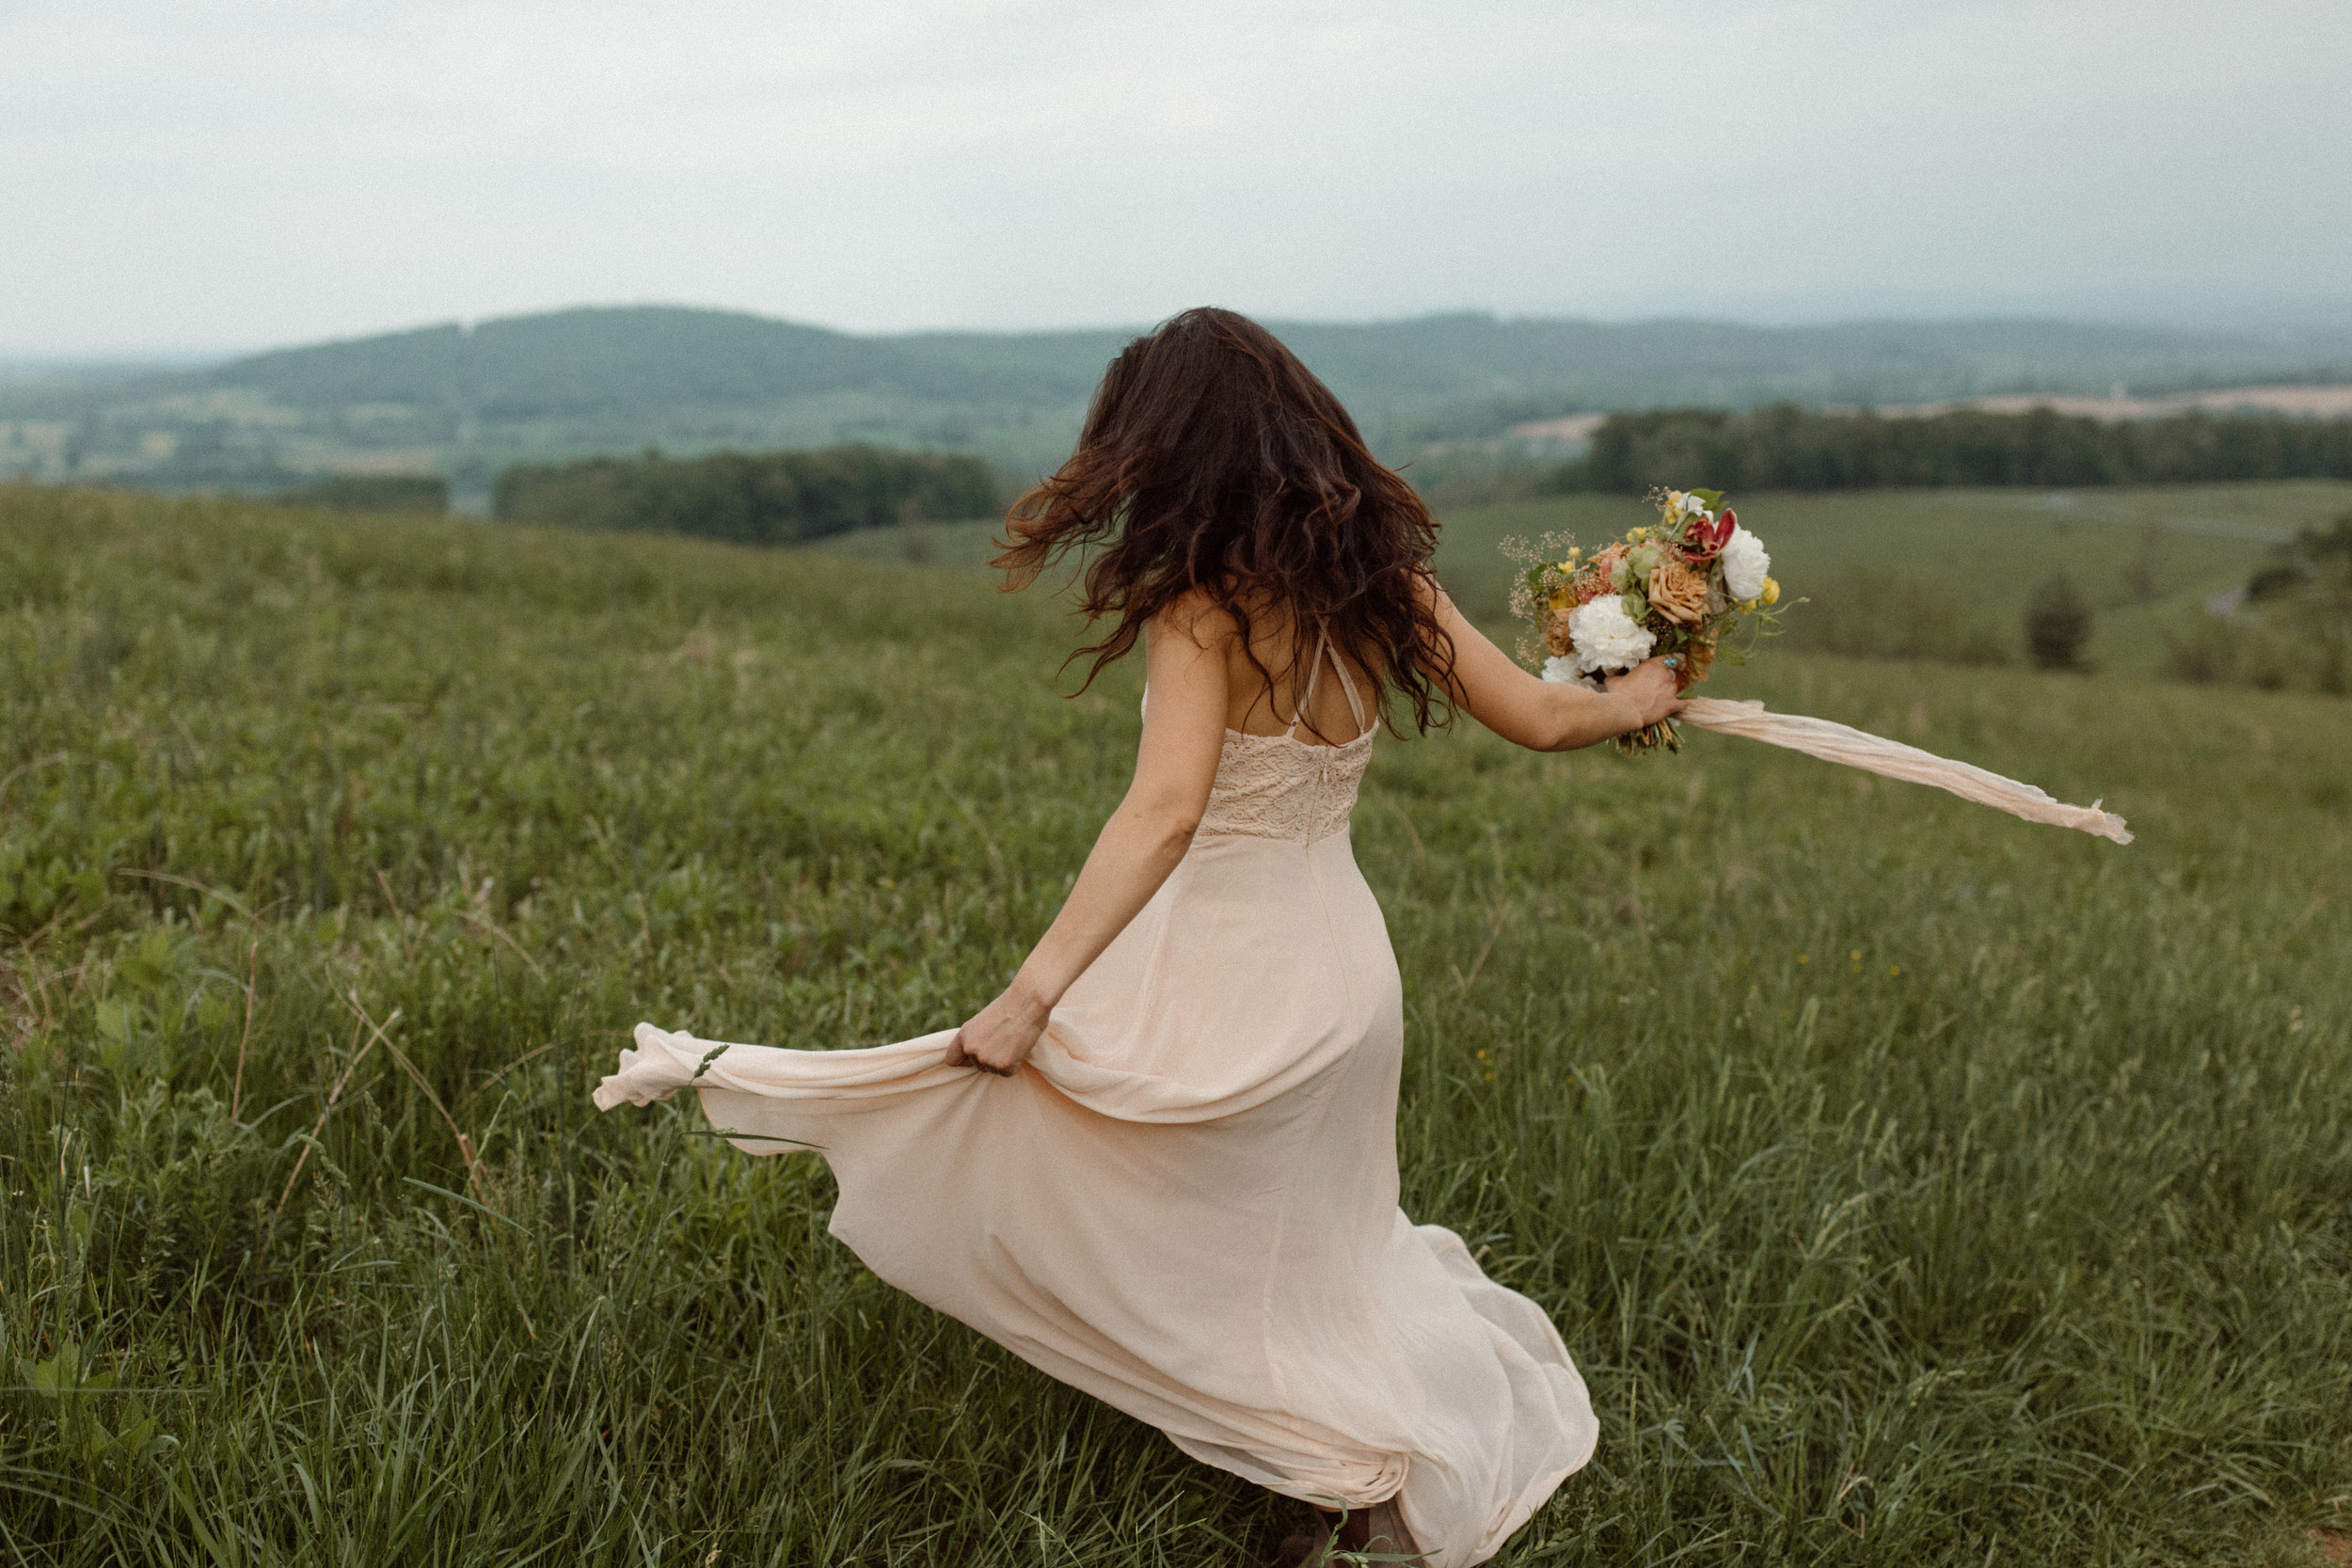 kelsey&mark-engagement-skymeadows-2019-peytoncurry-9536.jpg